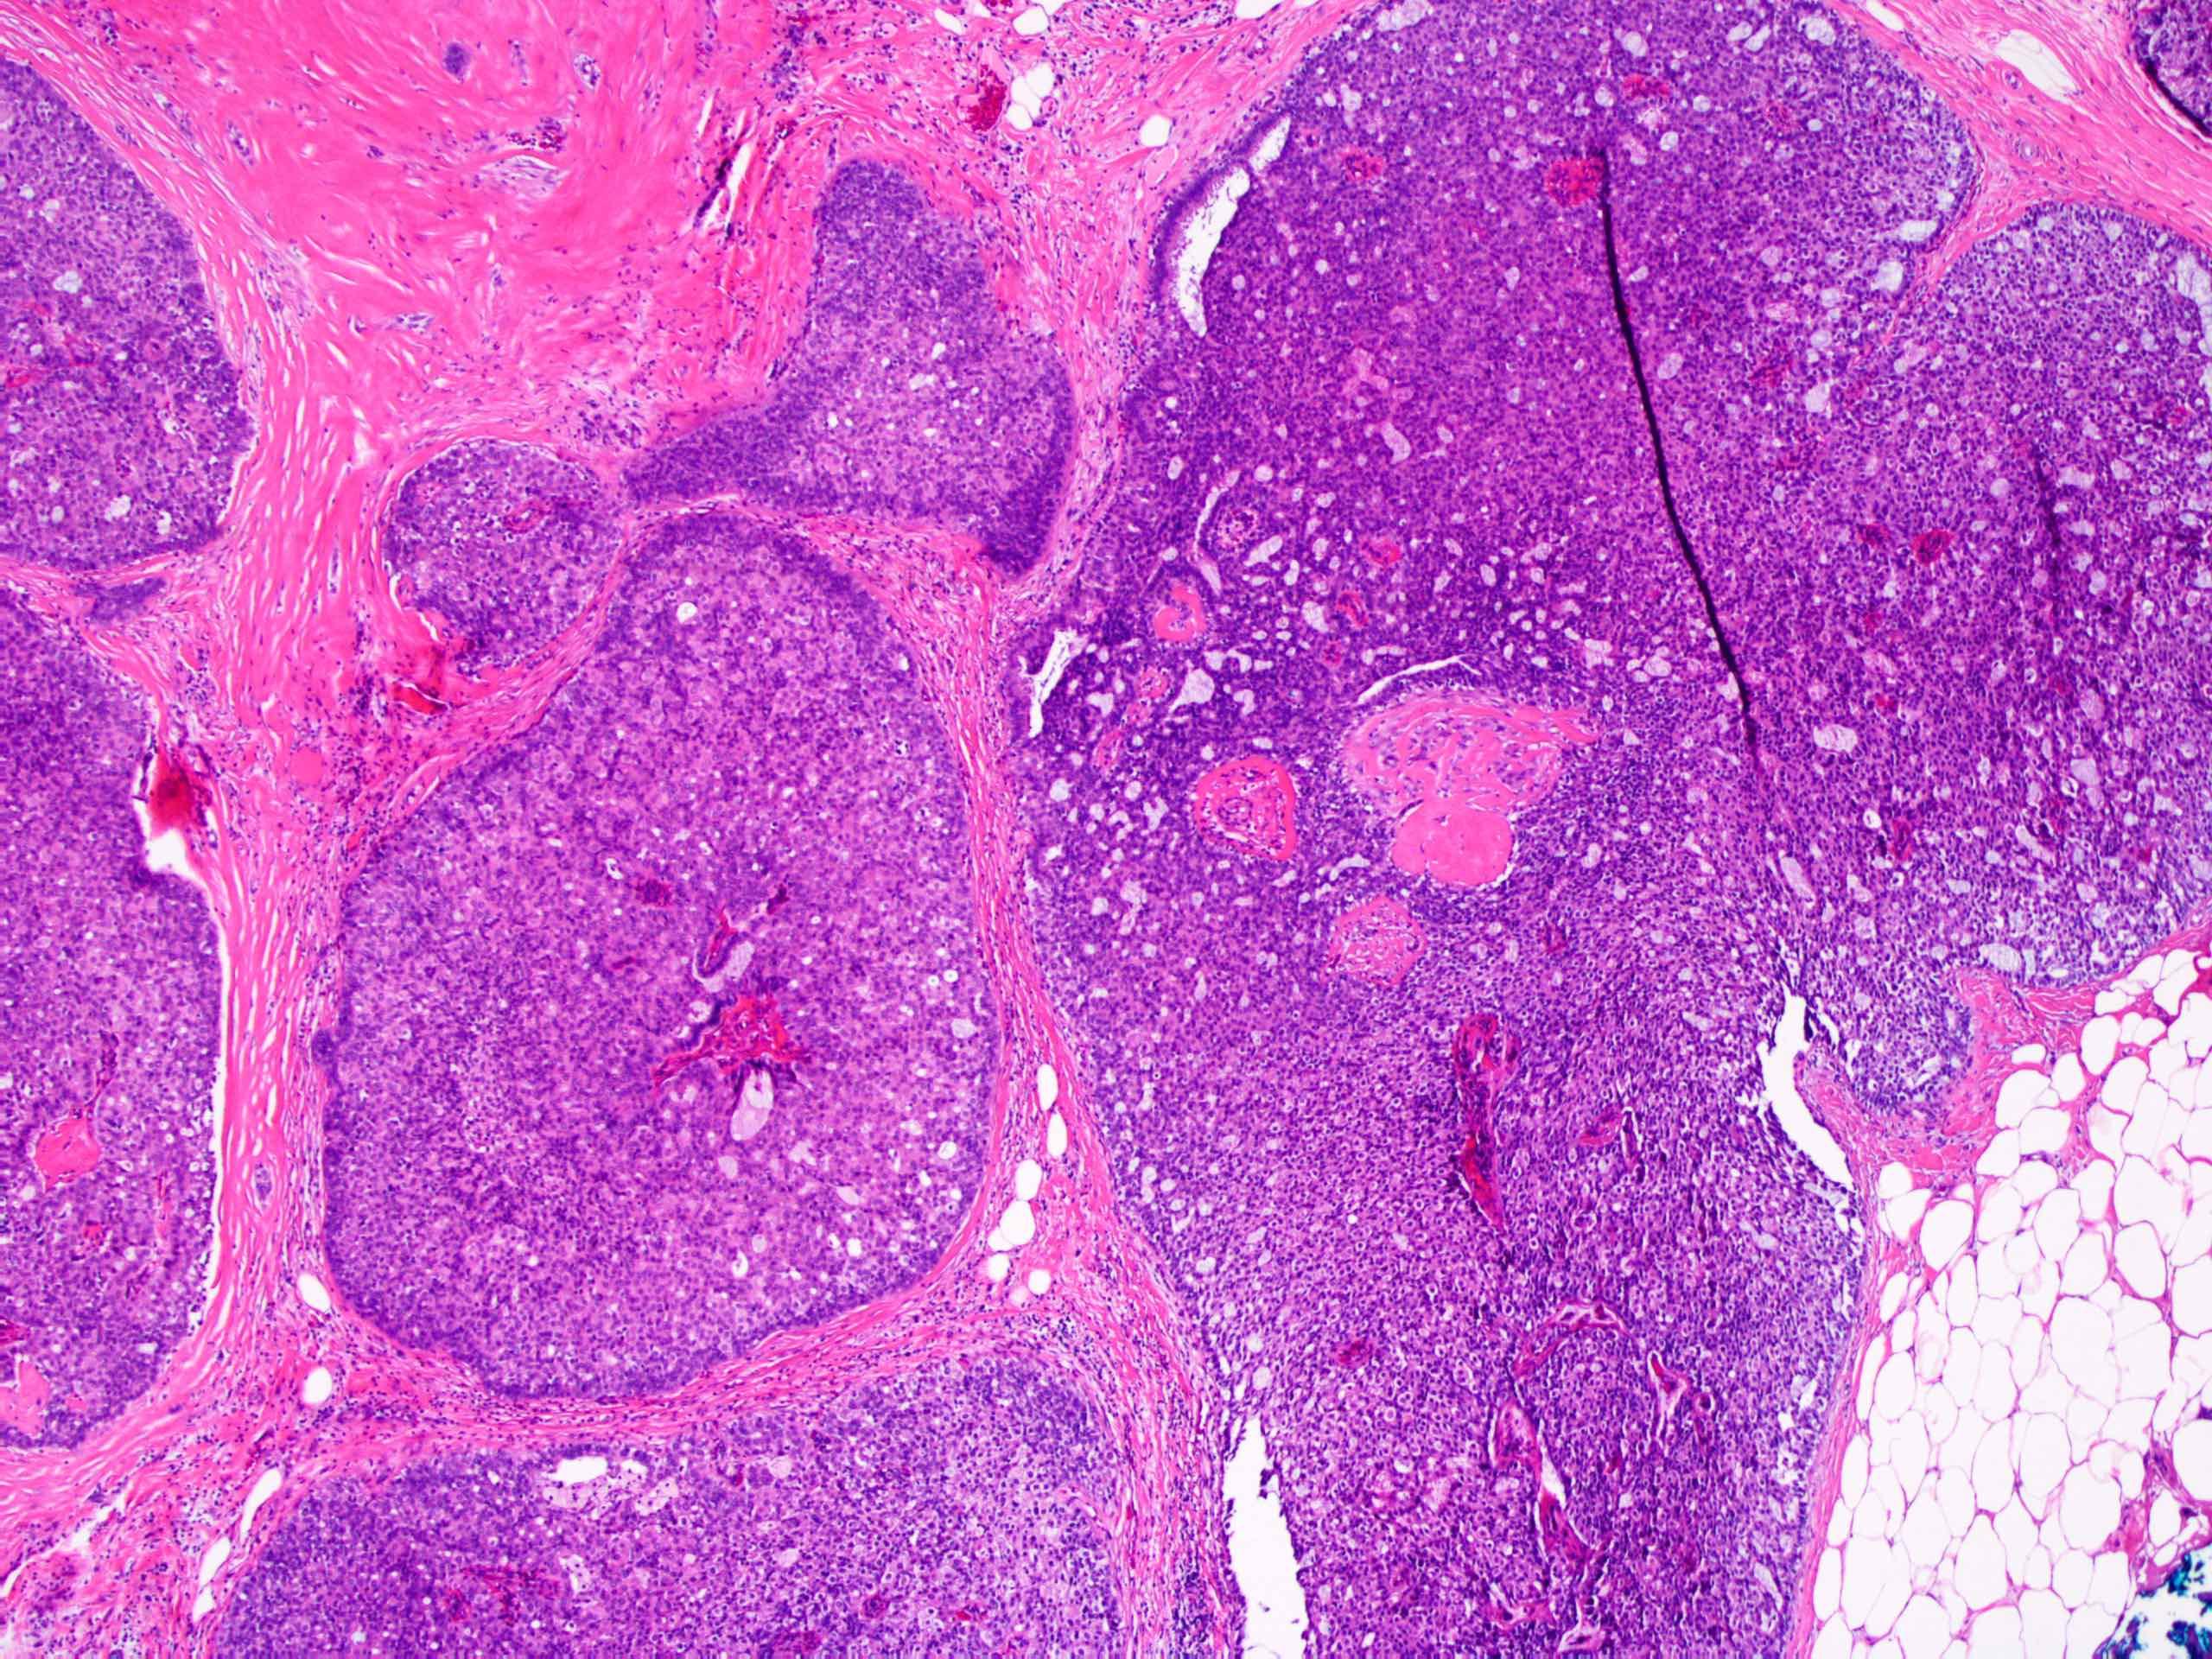 atipikus ductalis papilloma scolex galandféreg